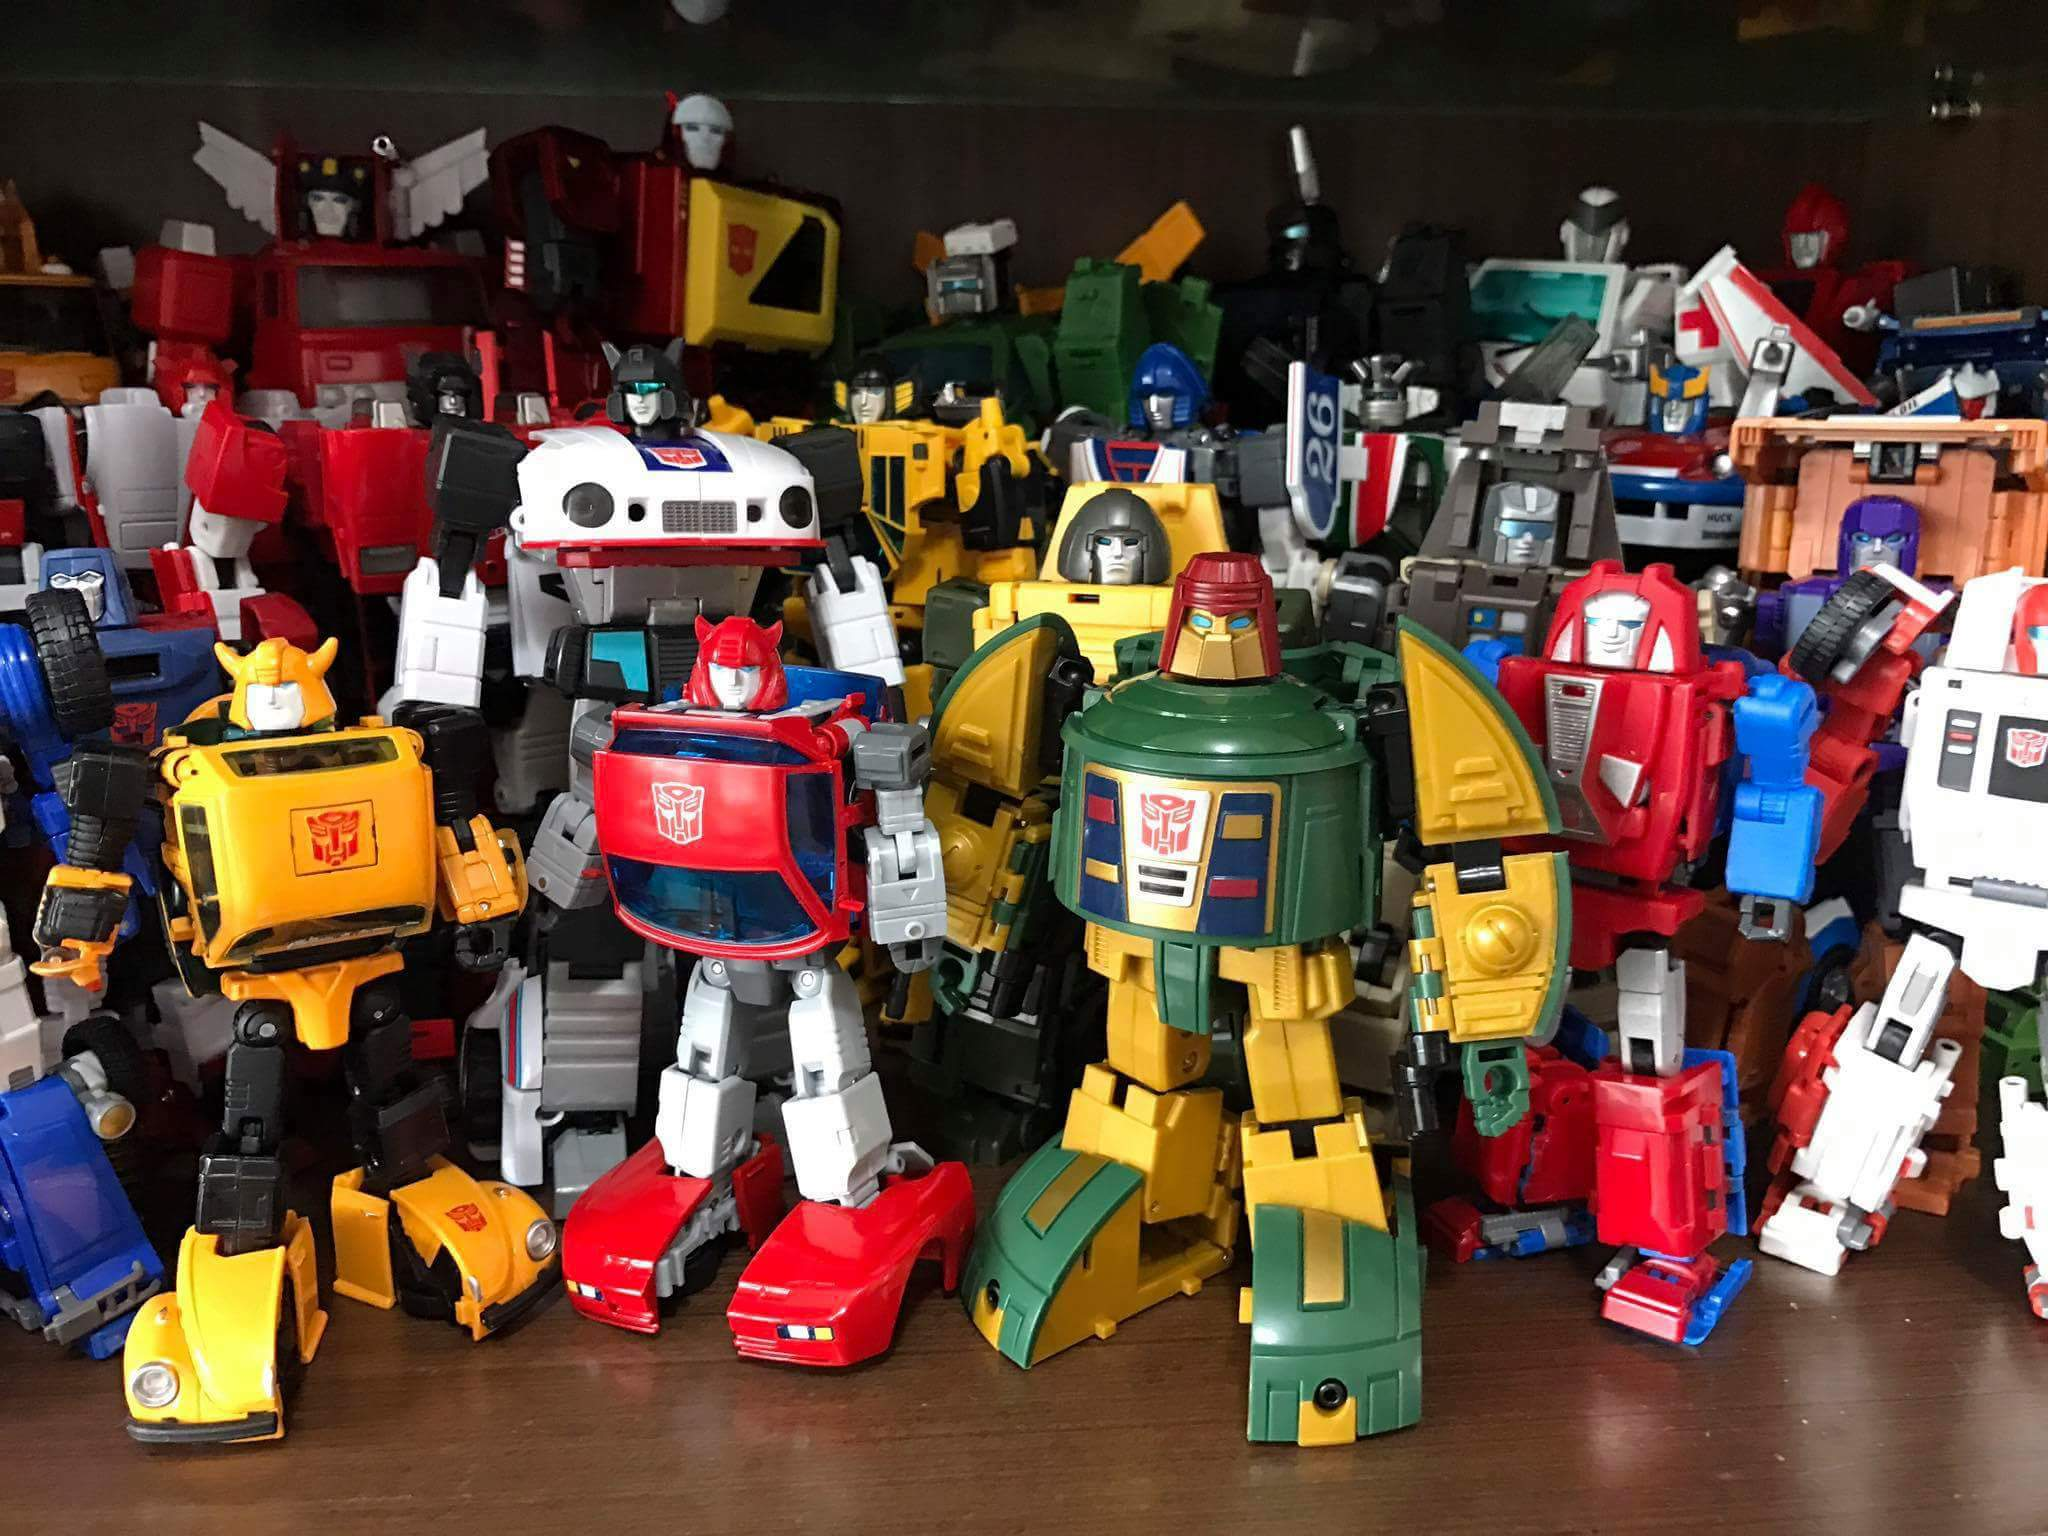 [Toyworld][Zeta Toys] Produit Tiers - Minibots MP - Gamme EX - Page 2 NoKzInmX